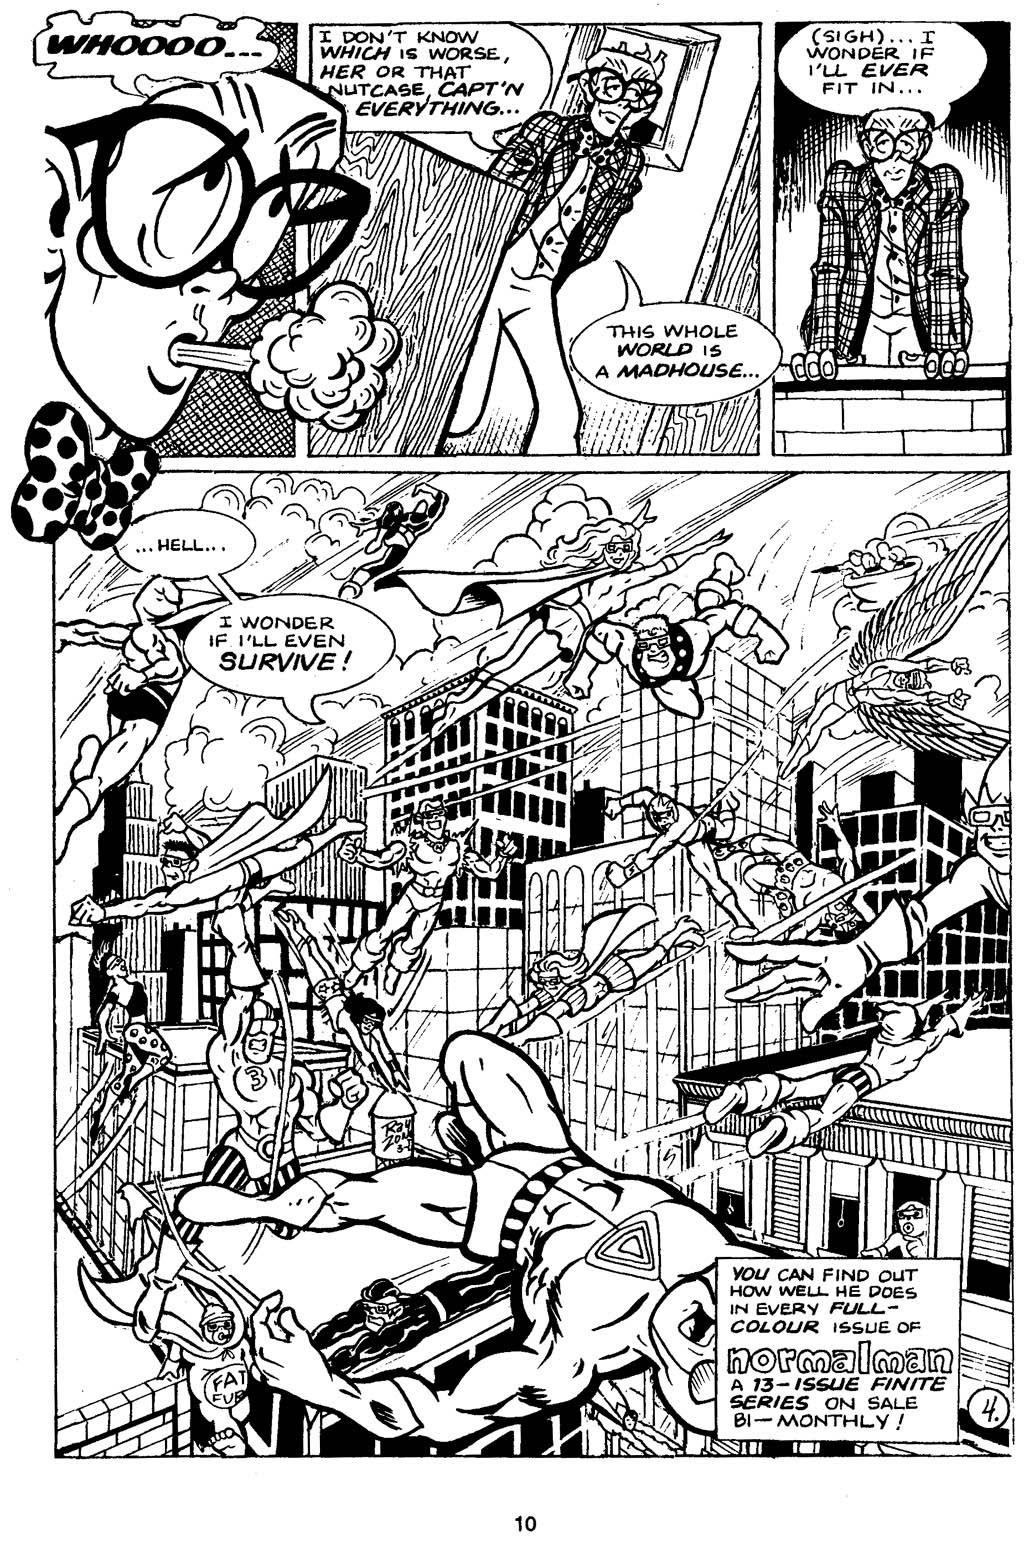 Read online Normalman - The Novel comic -  Issue # TPB (Part 1) - 15